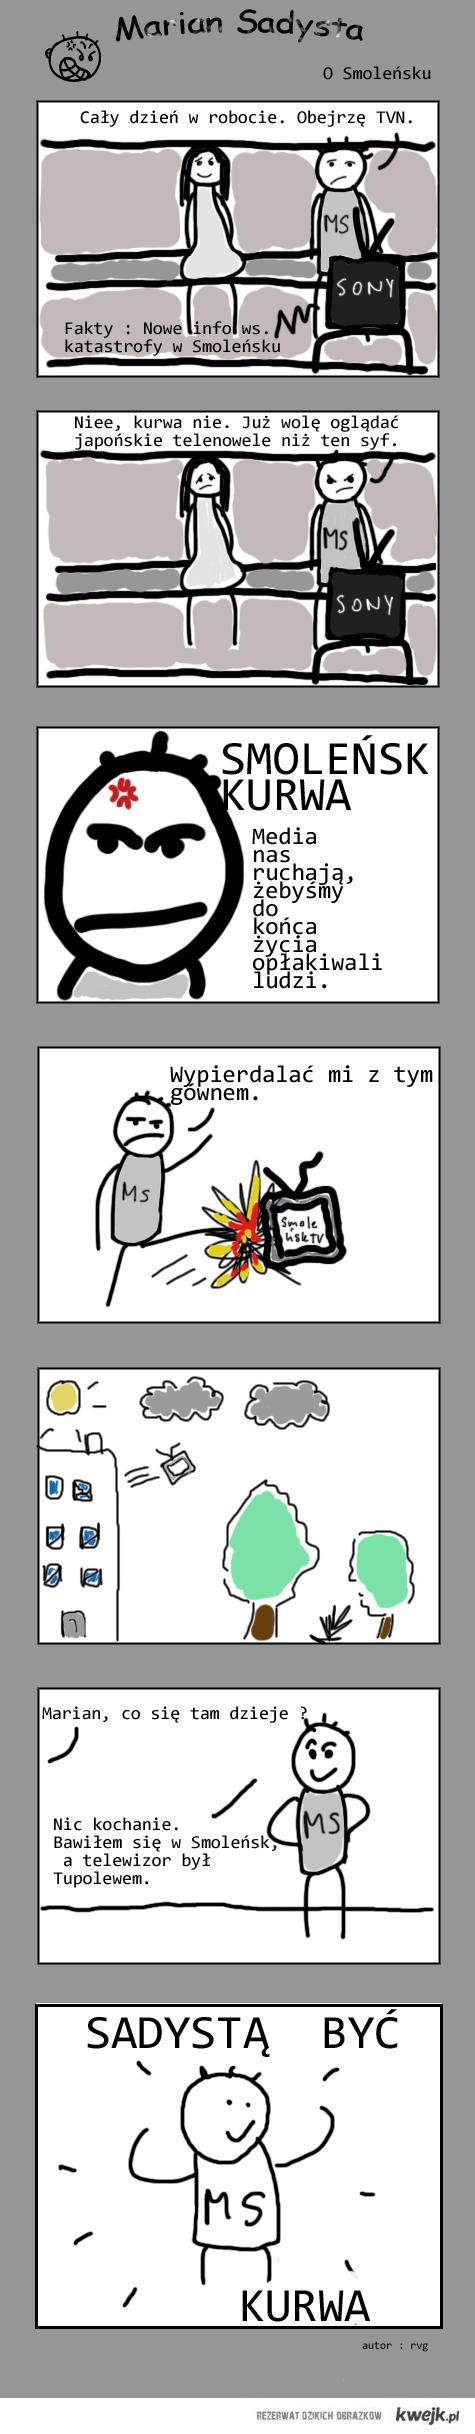 Marian Sadysta : O Smoleńsku